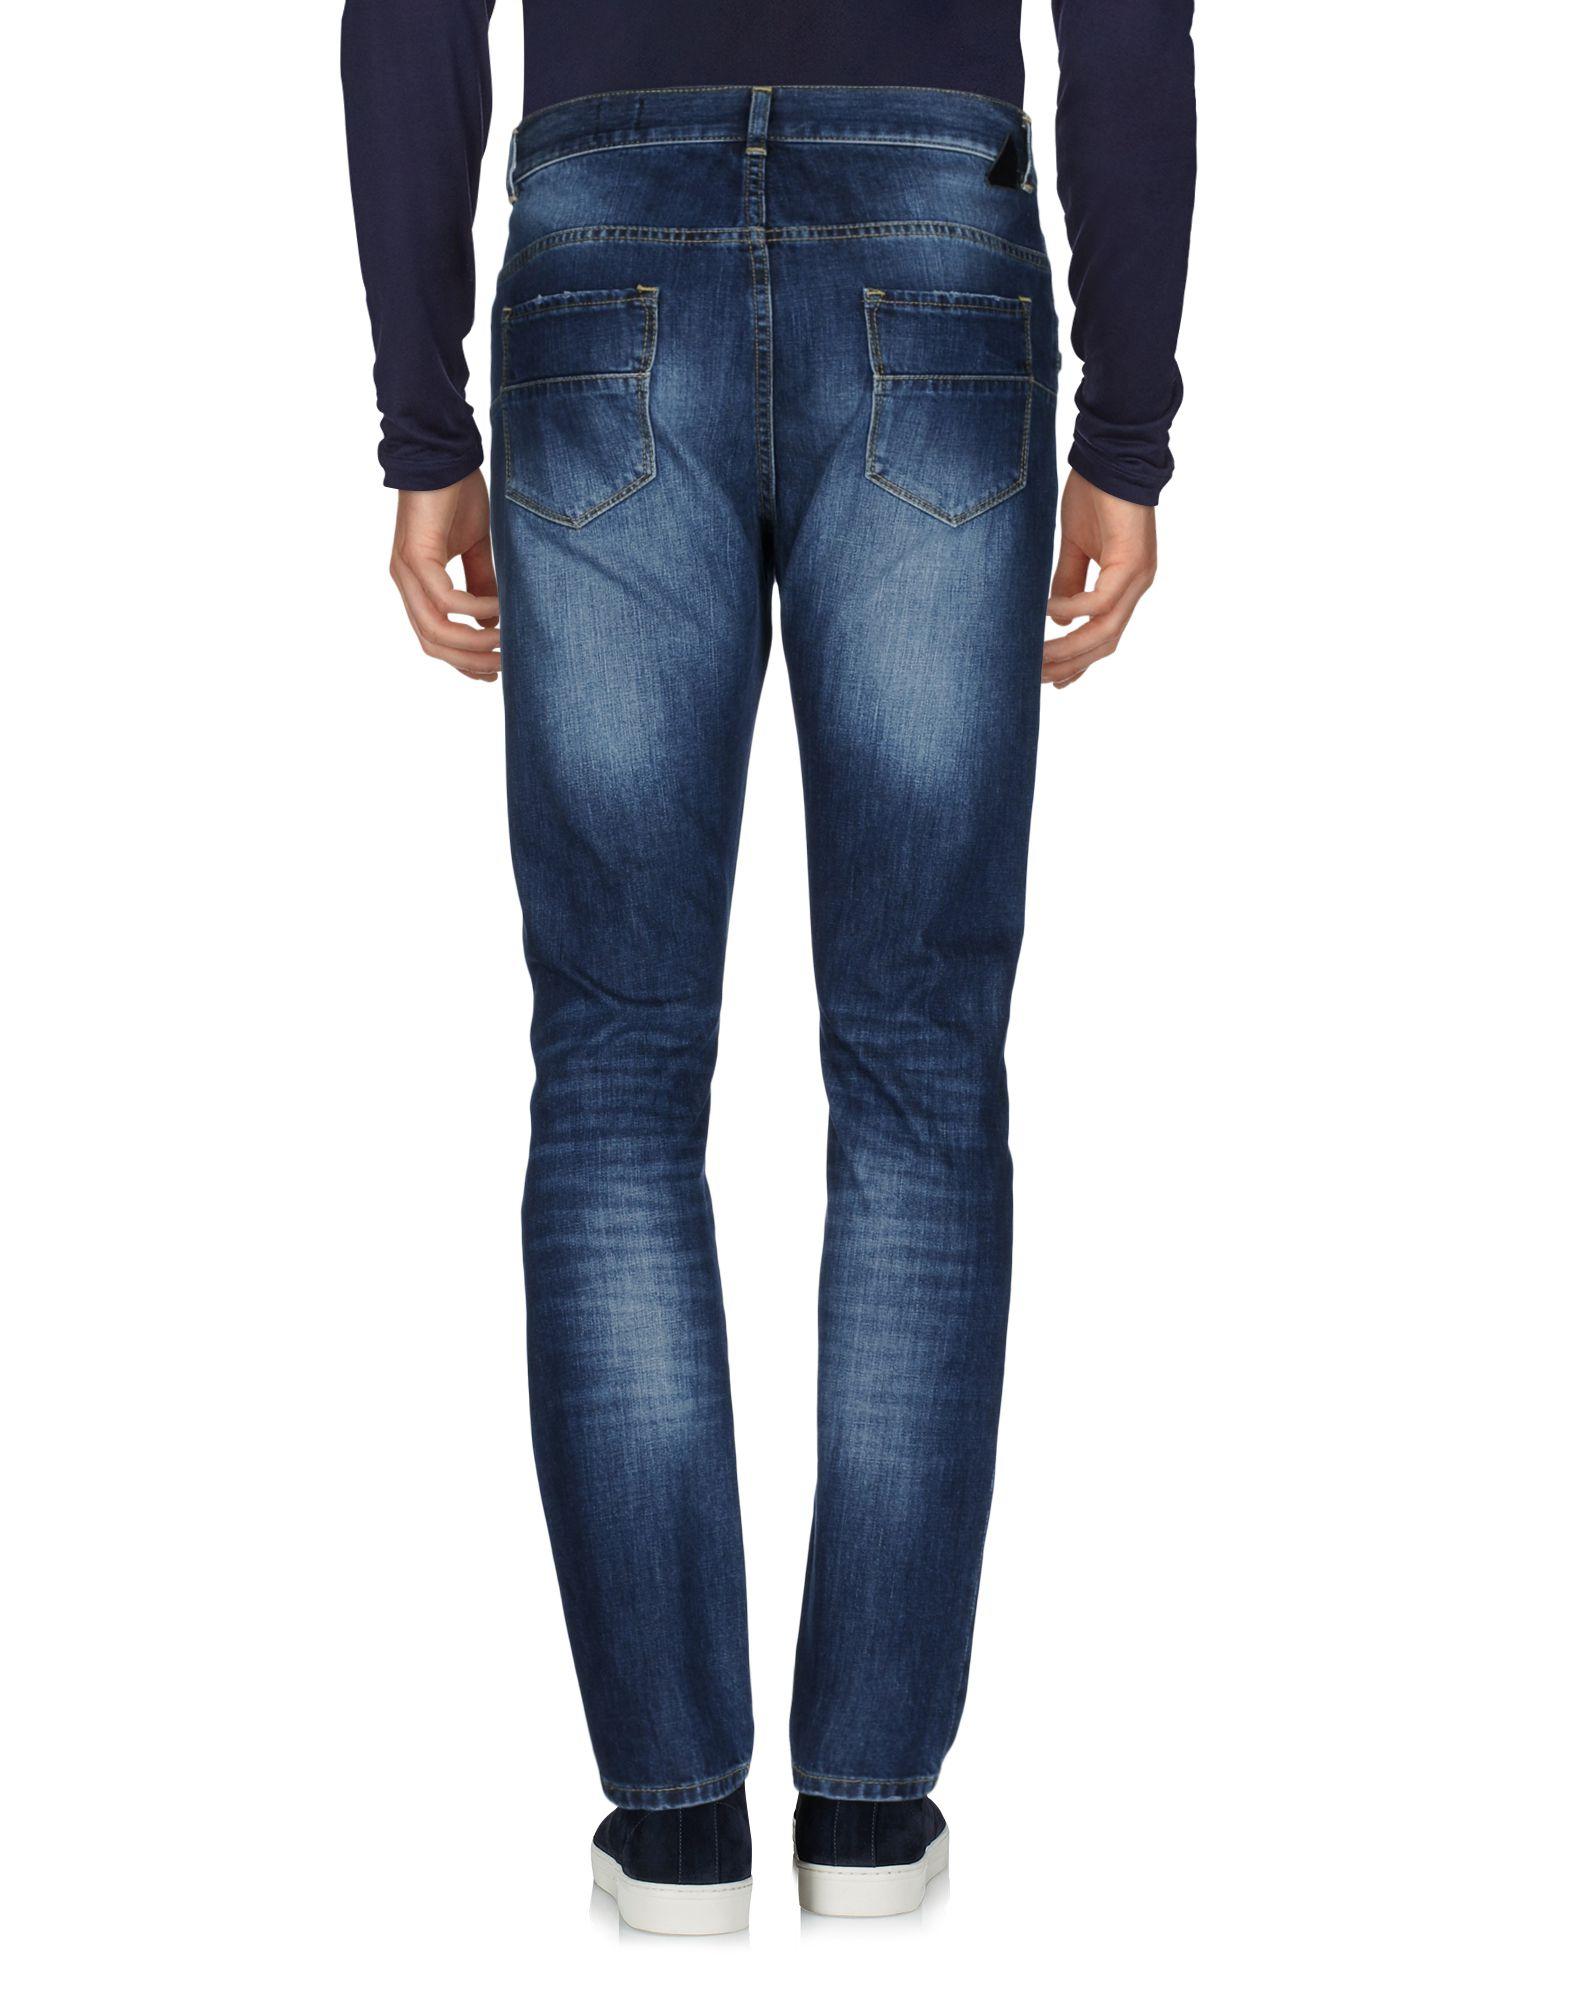 Pantaloni Jeans Daniele Daniele Daniele Alessandrini Uomo - 42598456JS d3f977